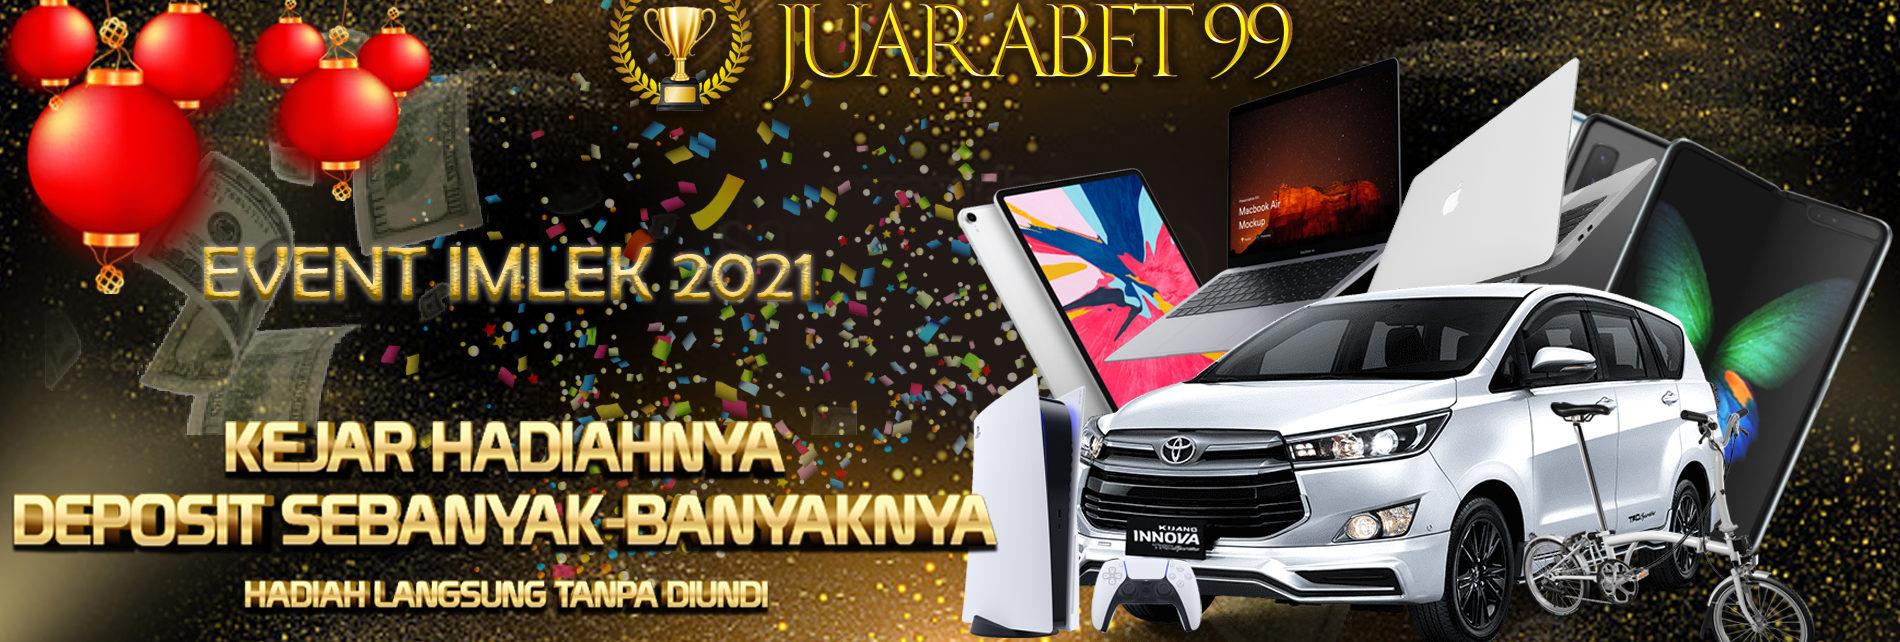 Juarabet99